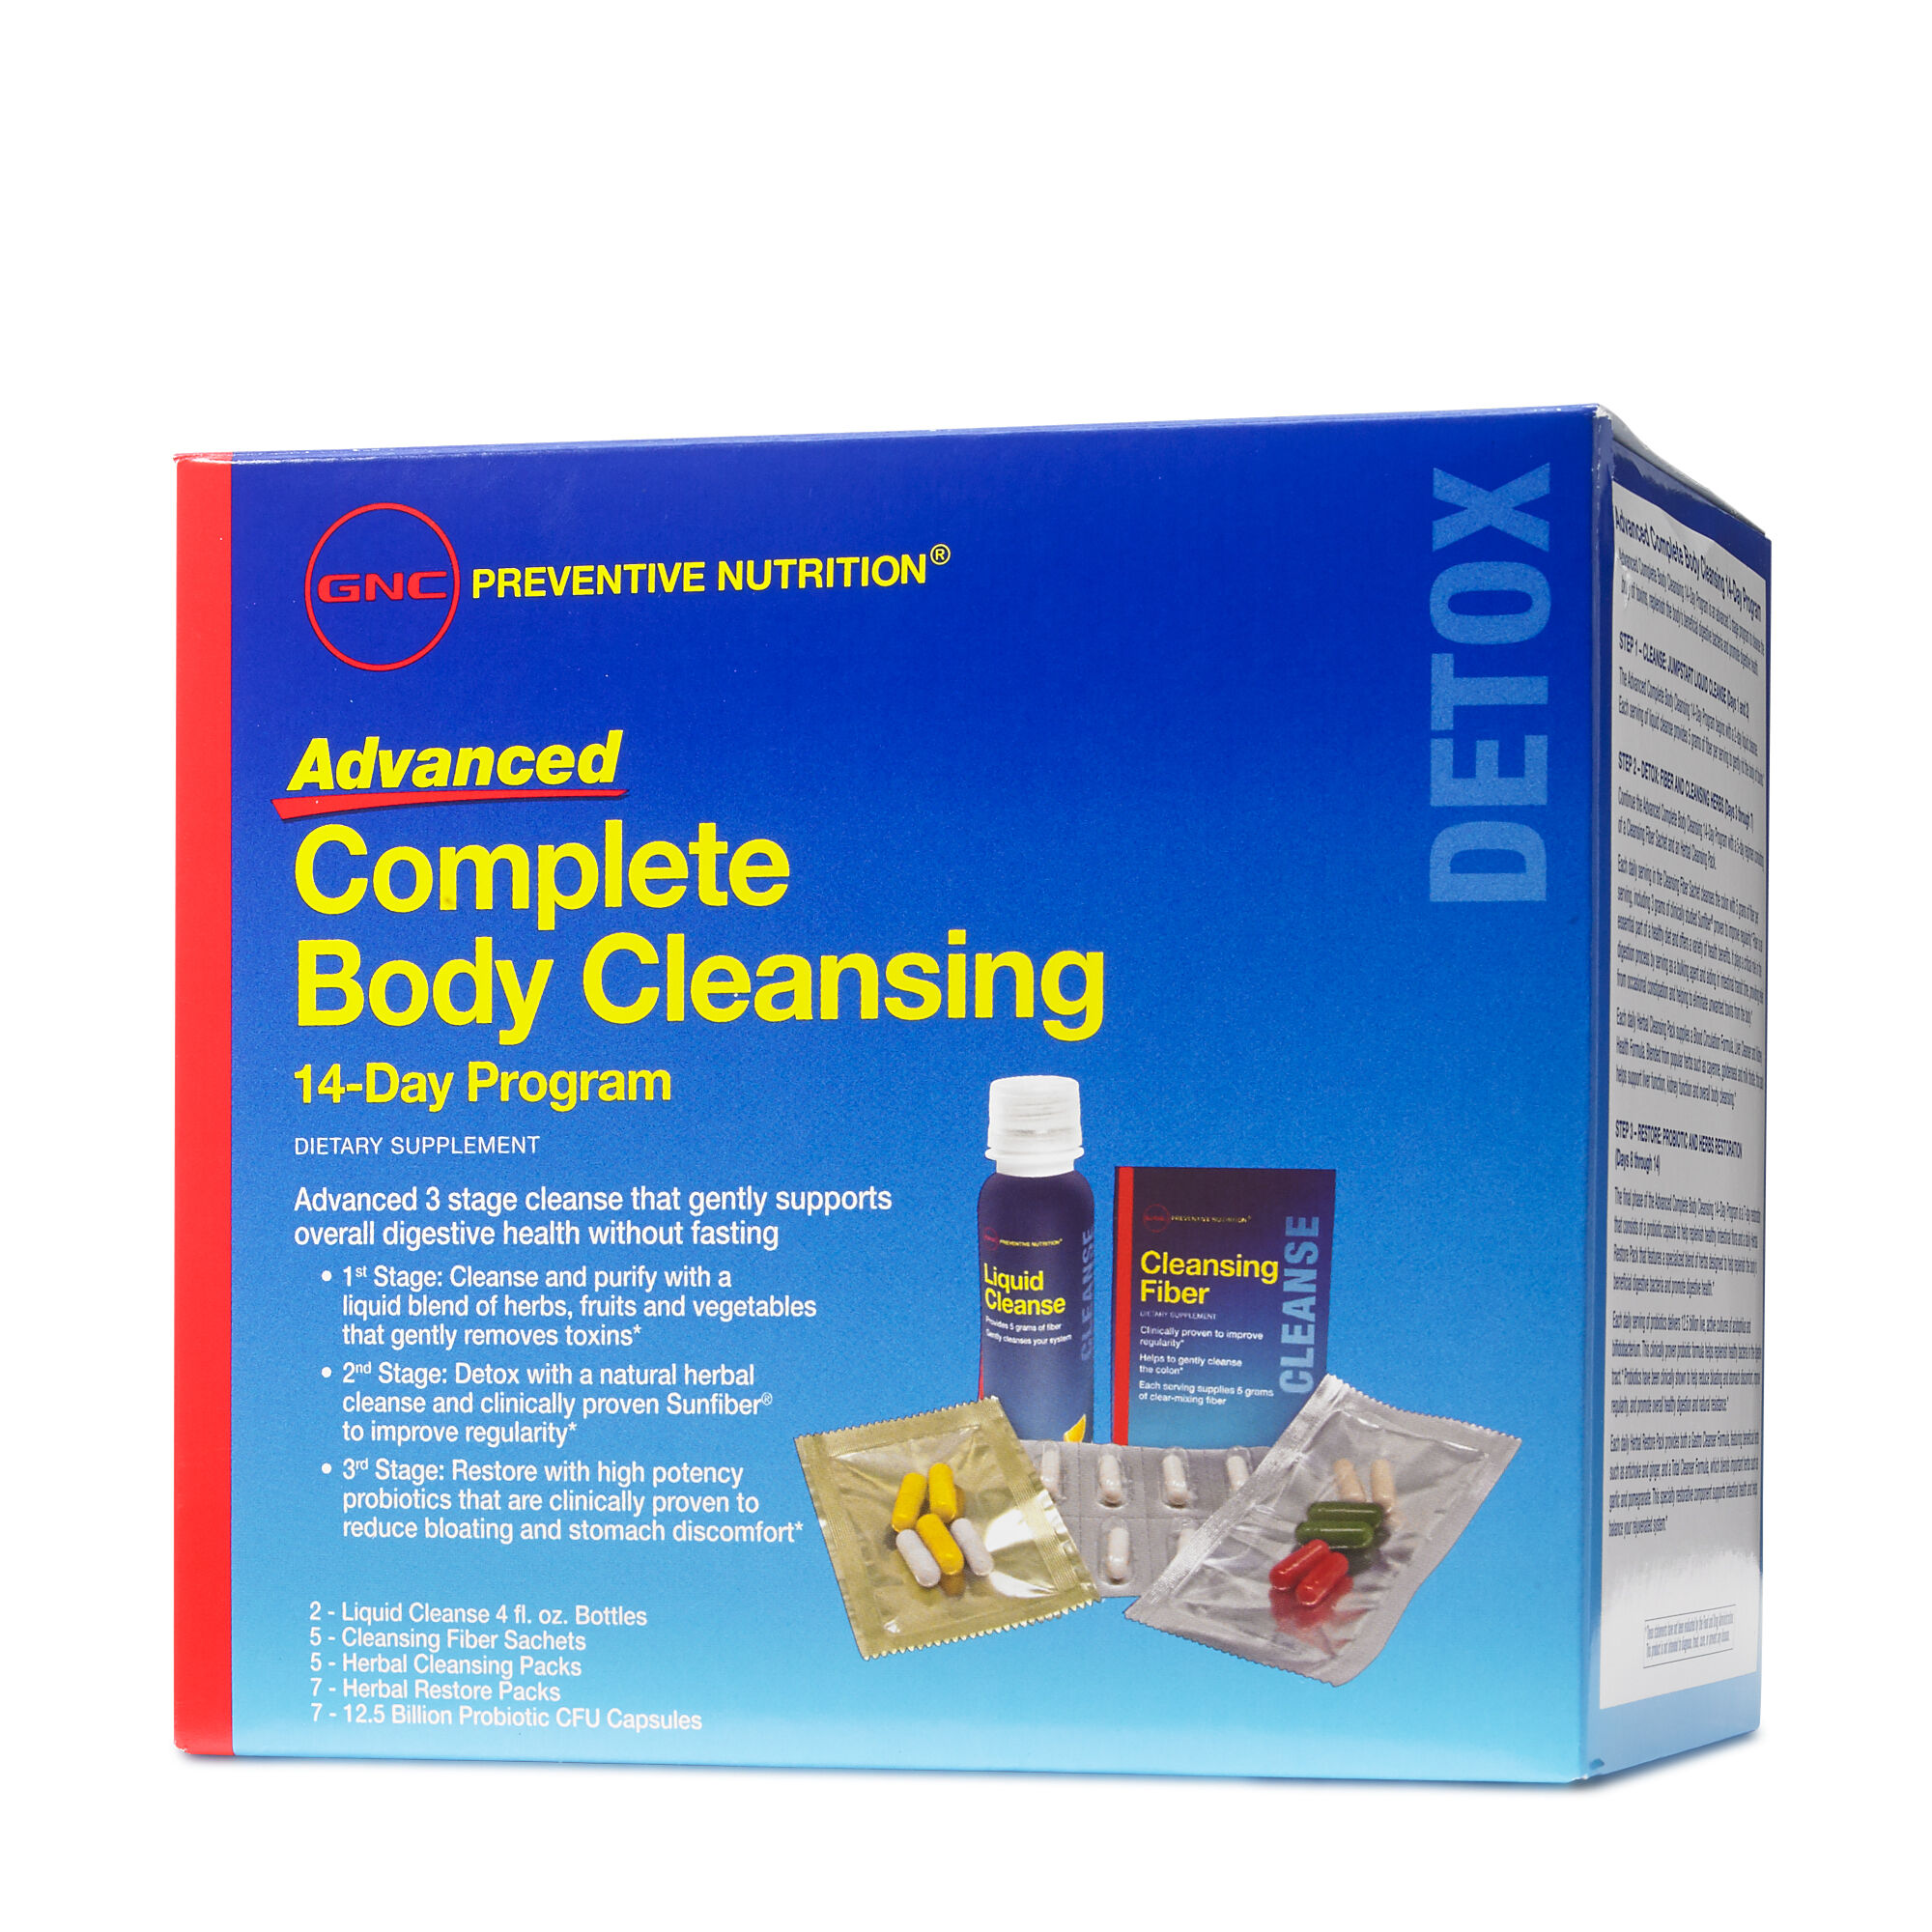 Natural Detox Cleanse Cleanse Detox In 2019 Cleanse Detox